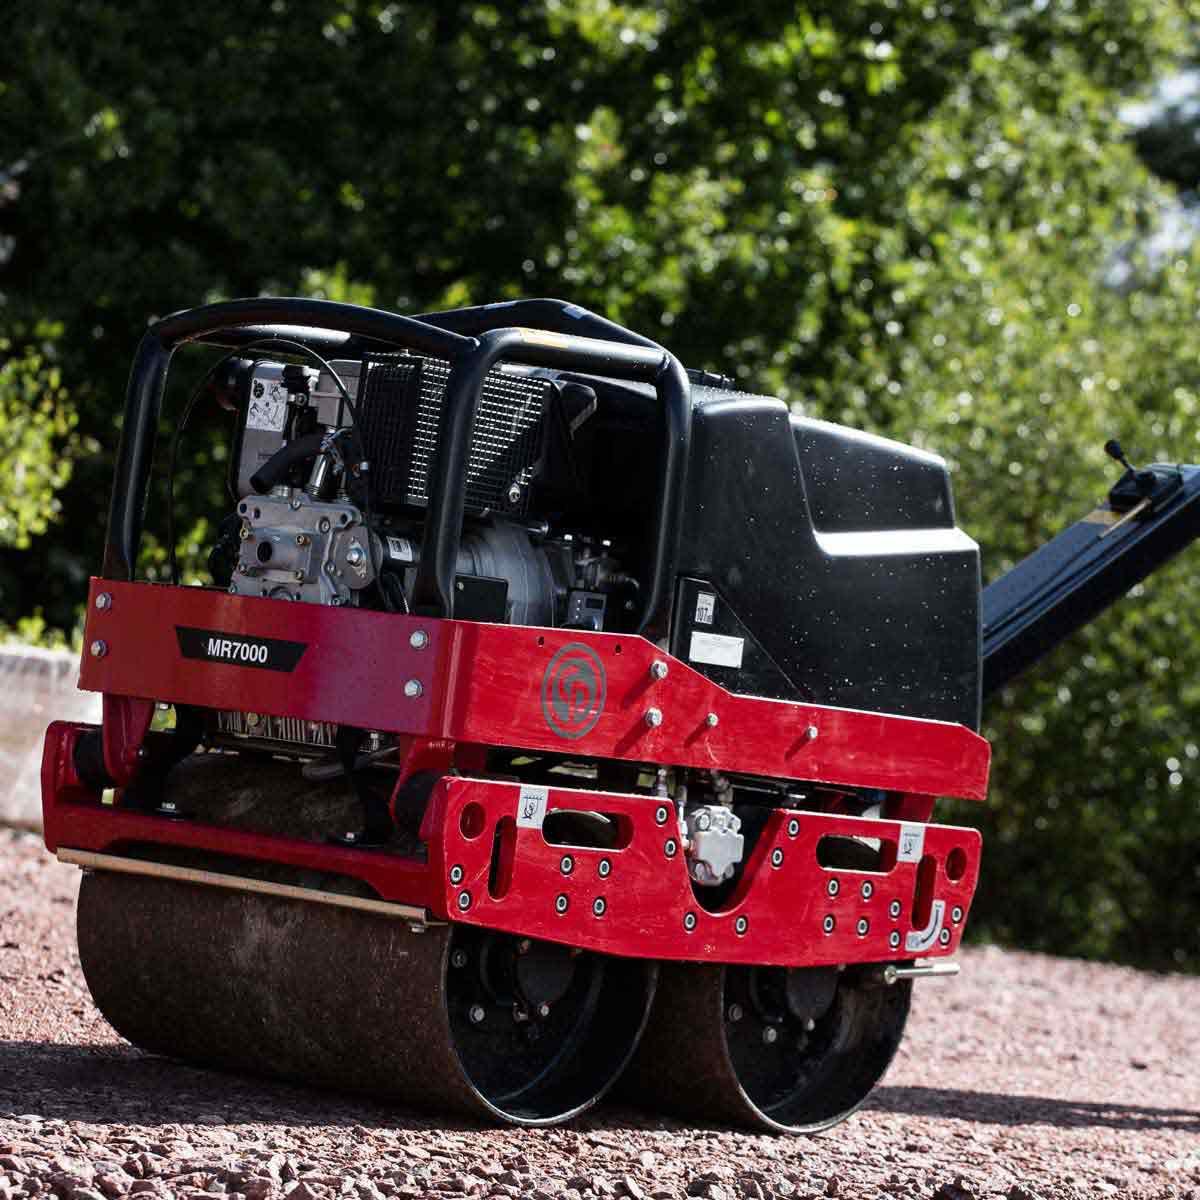 CP Diesel roller electric start